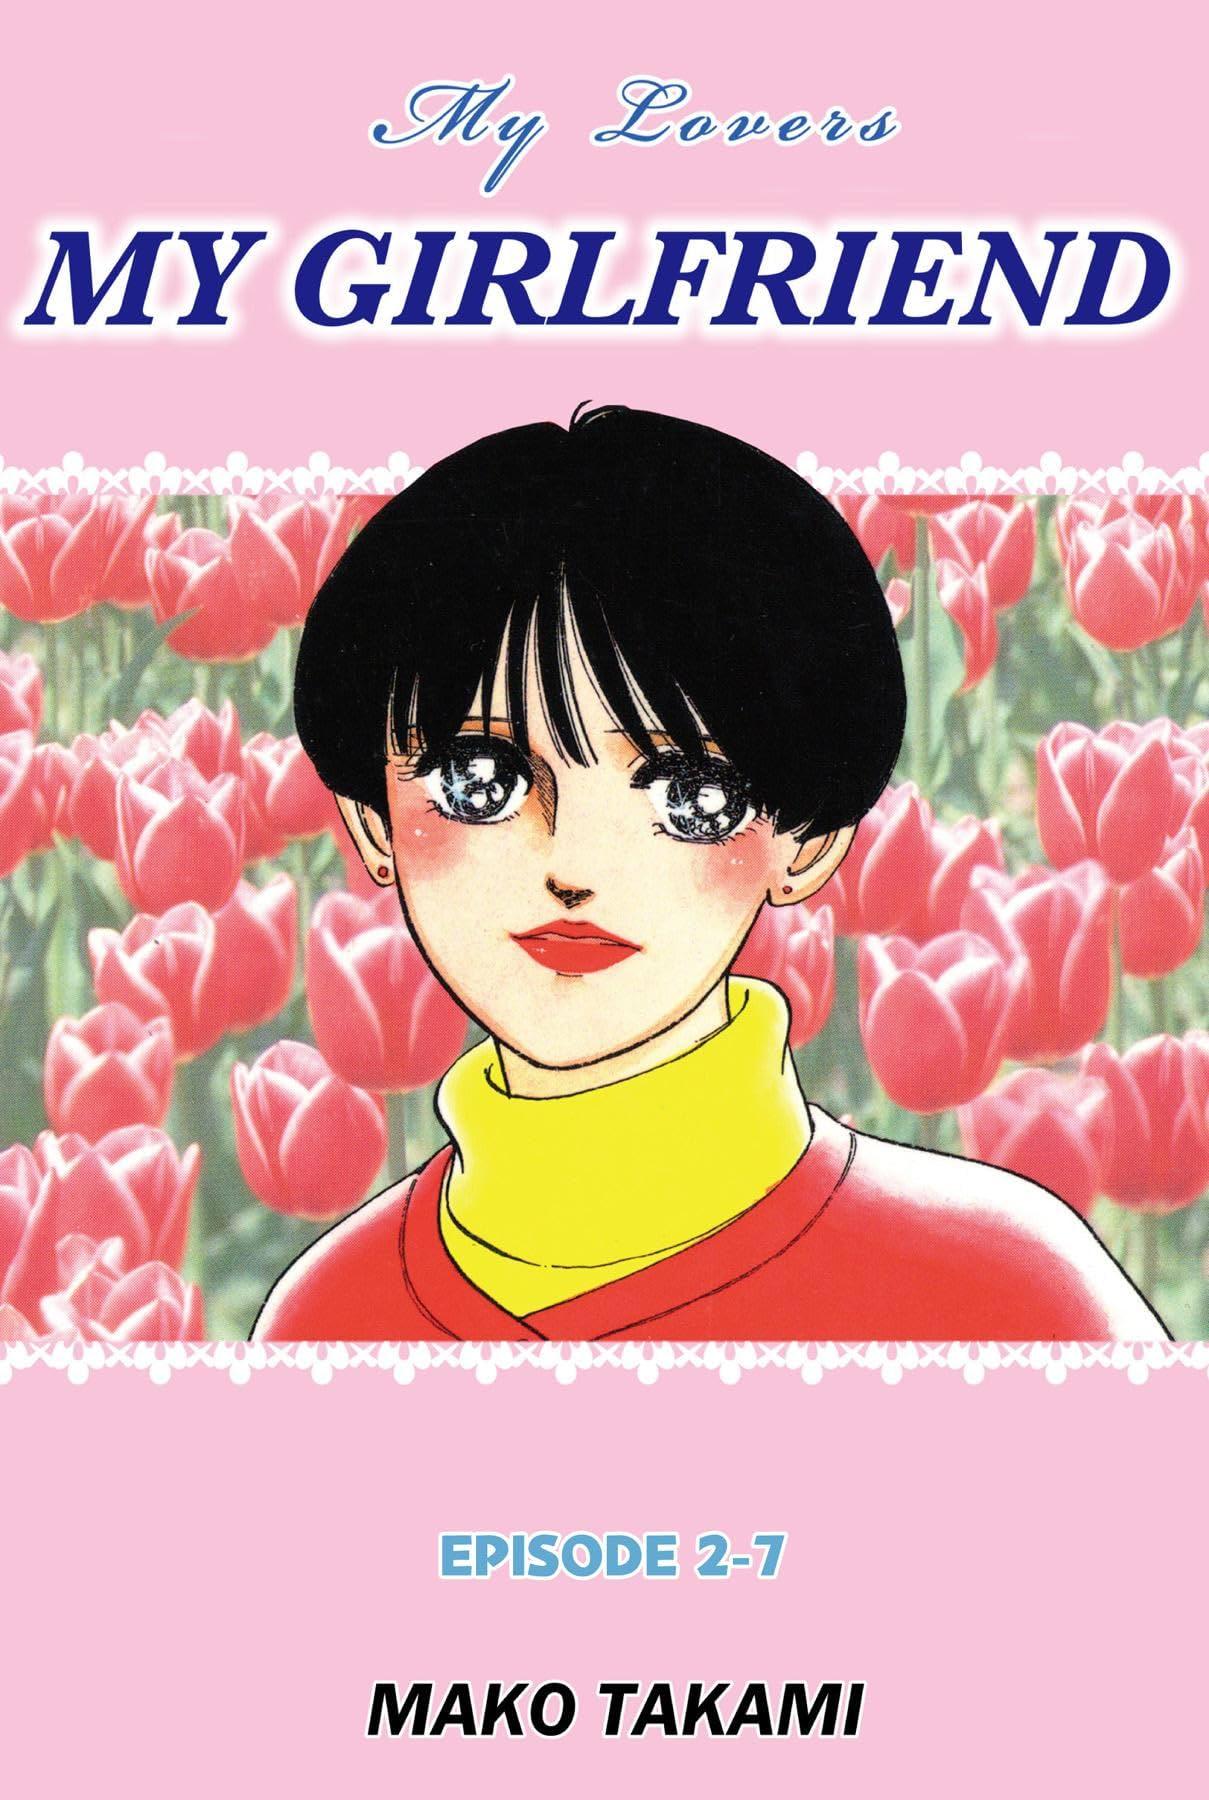 MY GIRLFRIEND #14